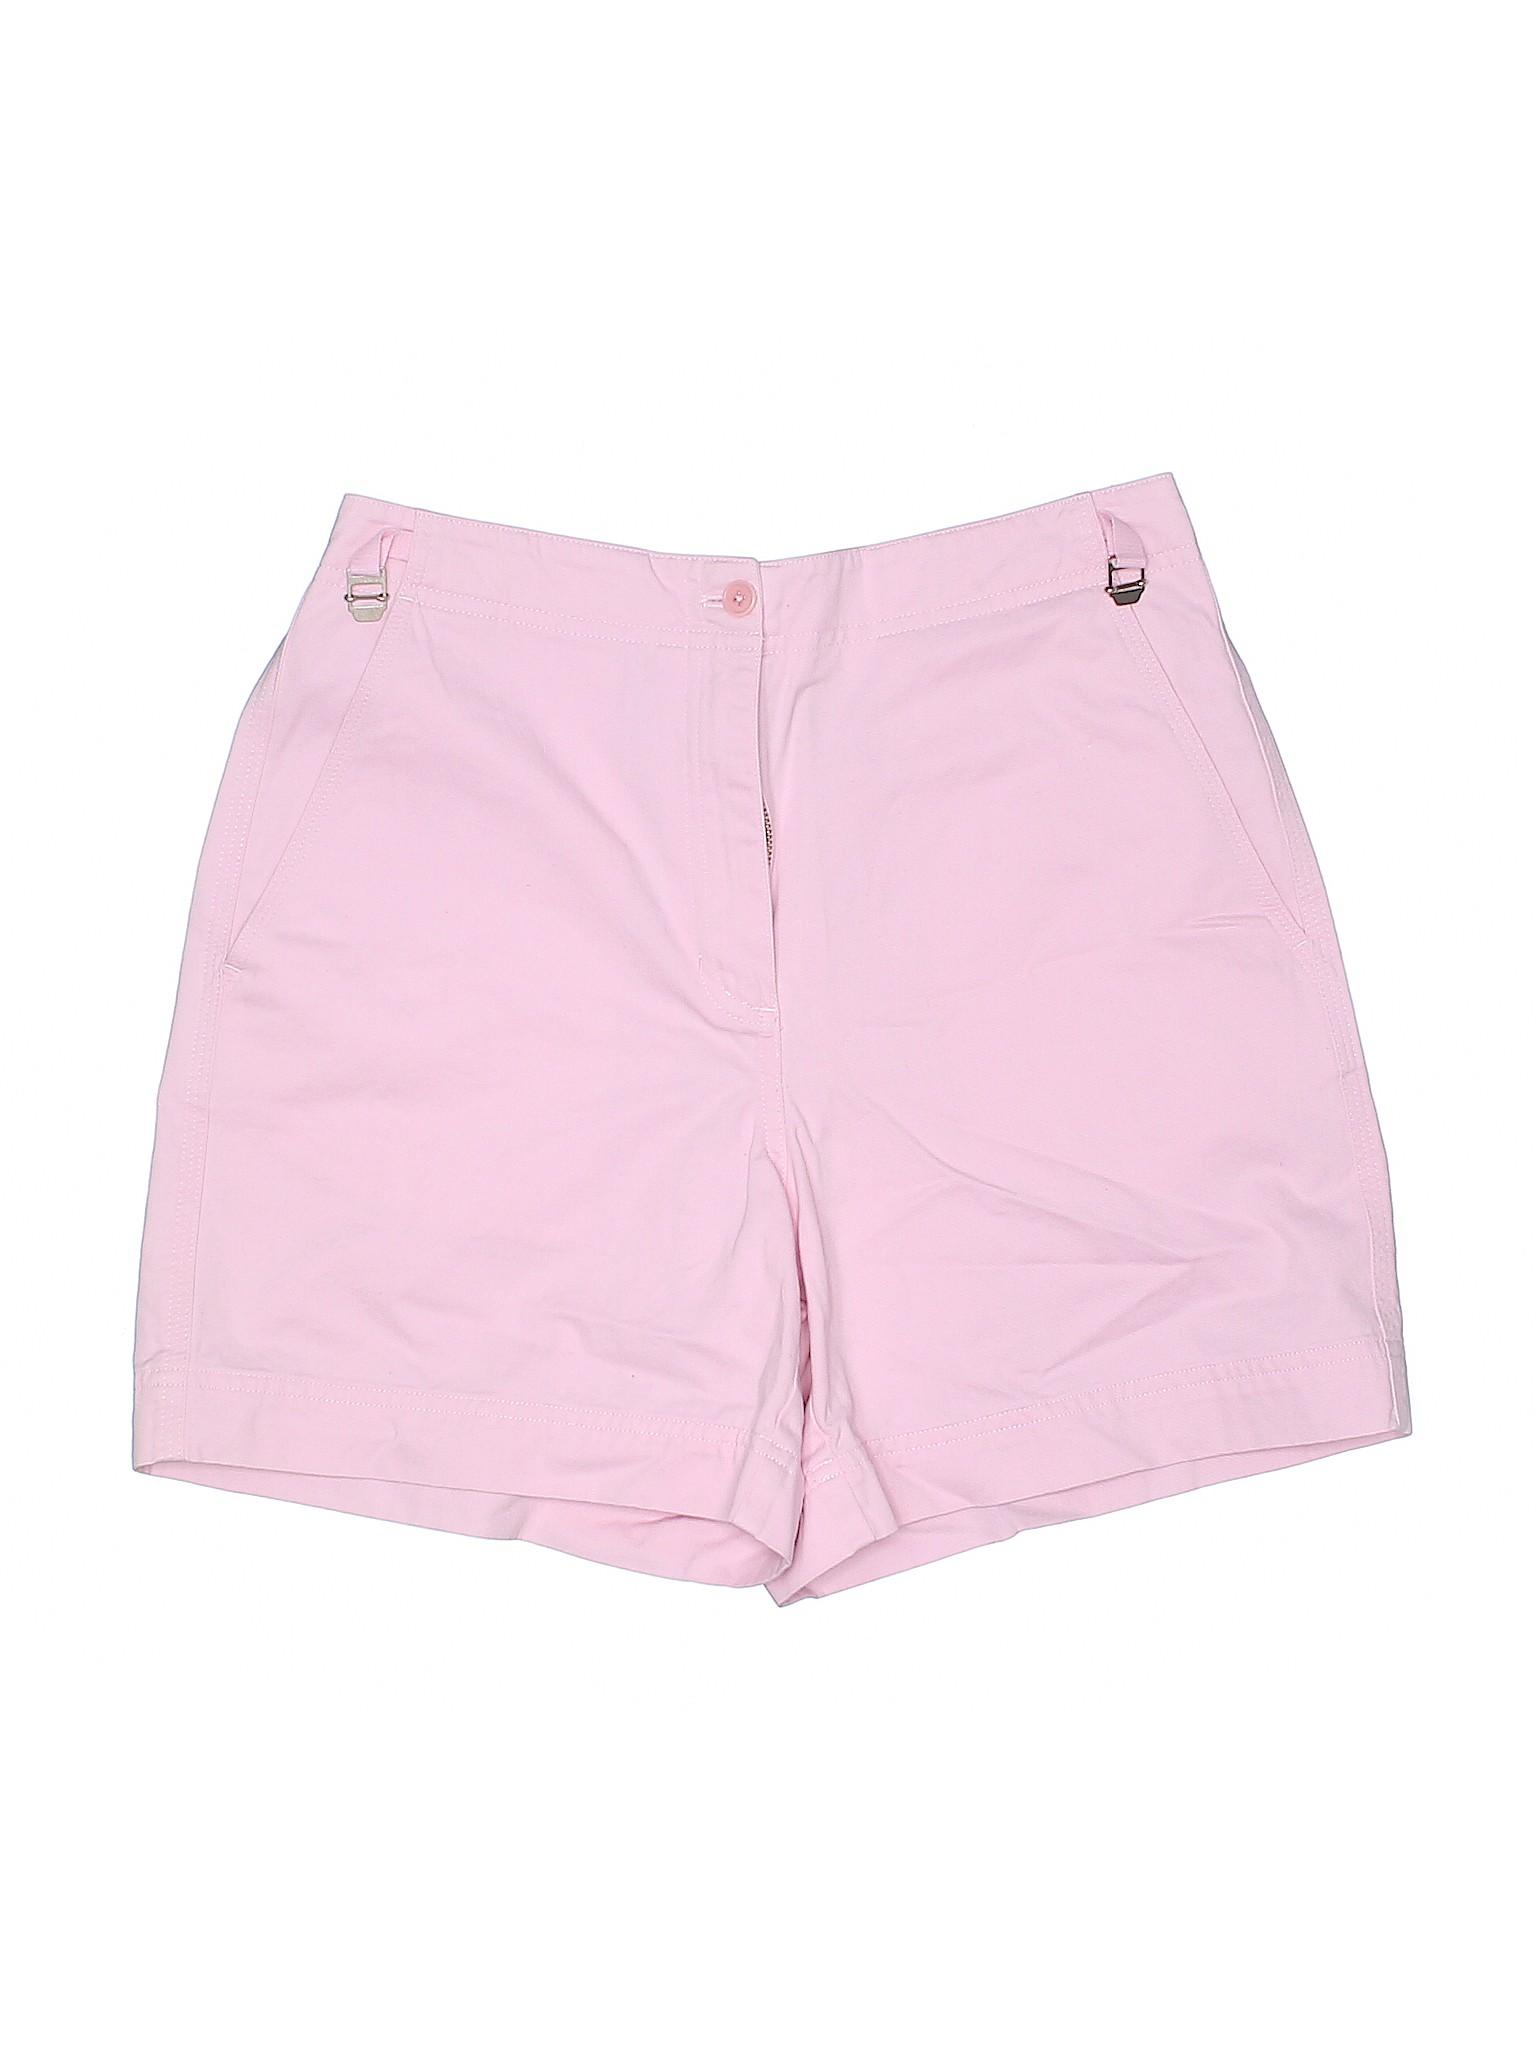 by Shorts Lauren Lauren Boutique Ralph POwvBaq